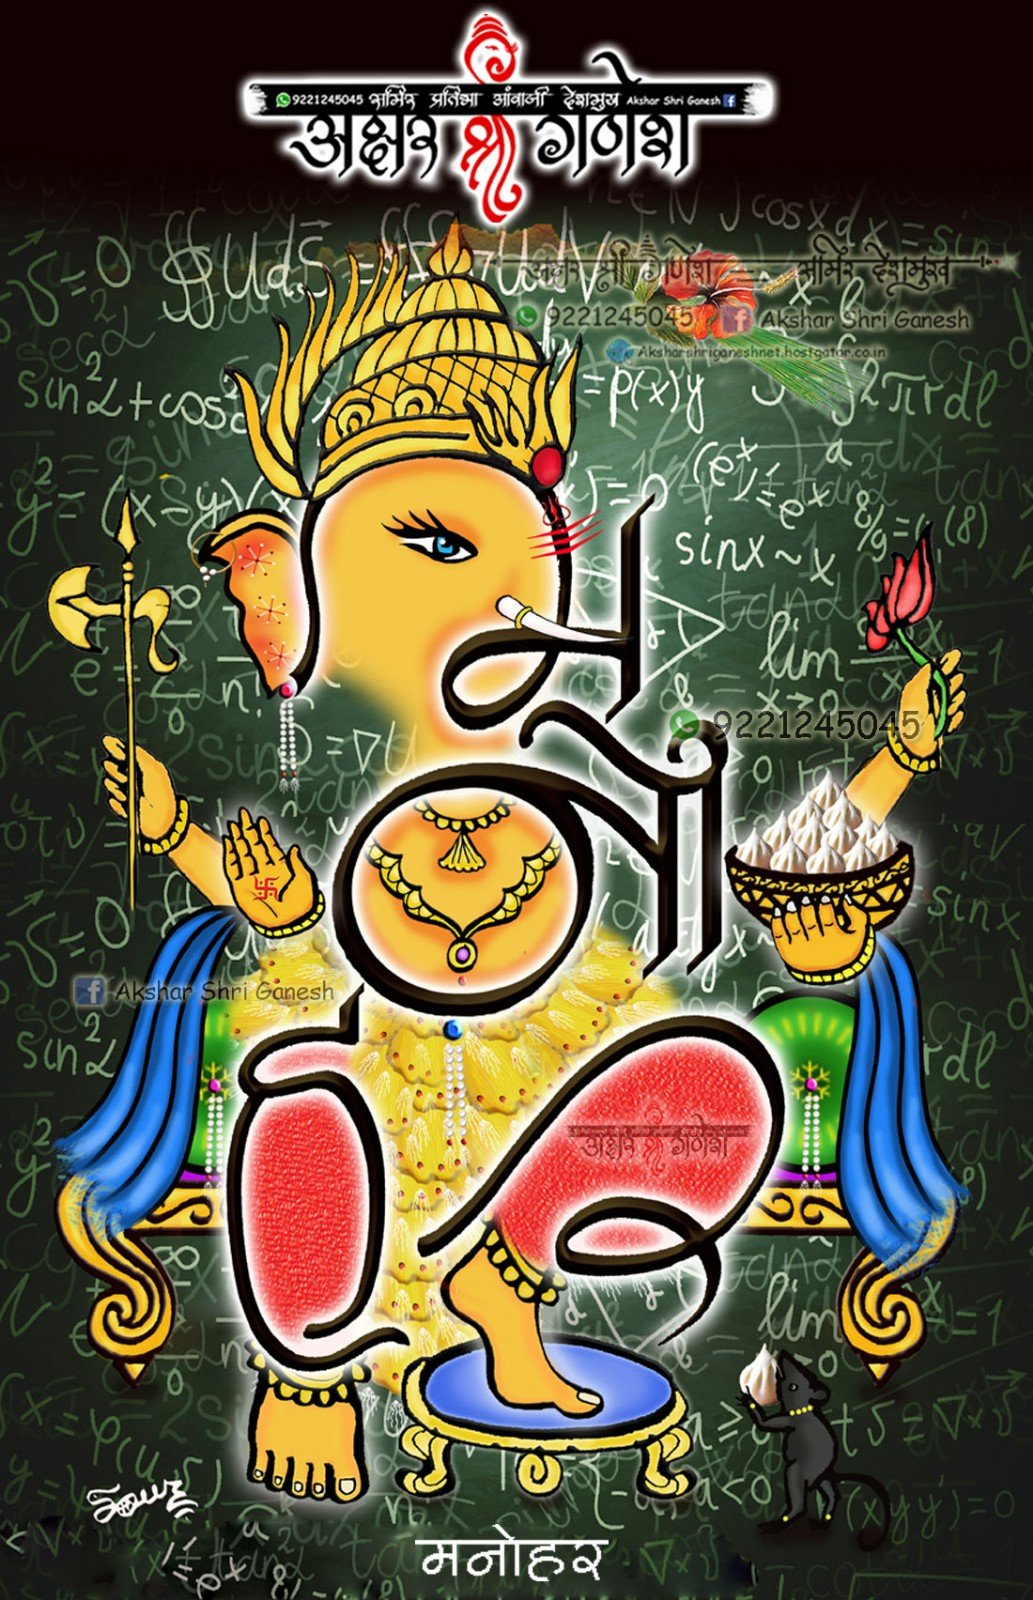 Akshar Ganesh Art Images Gadget And PC Wallpaper